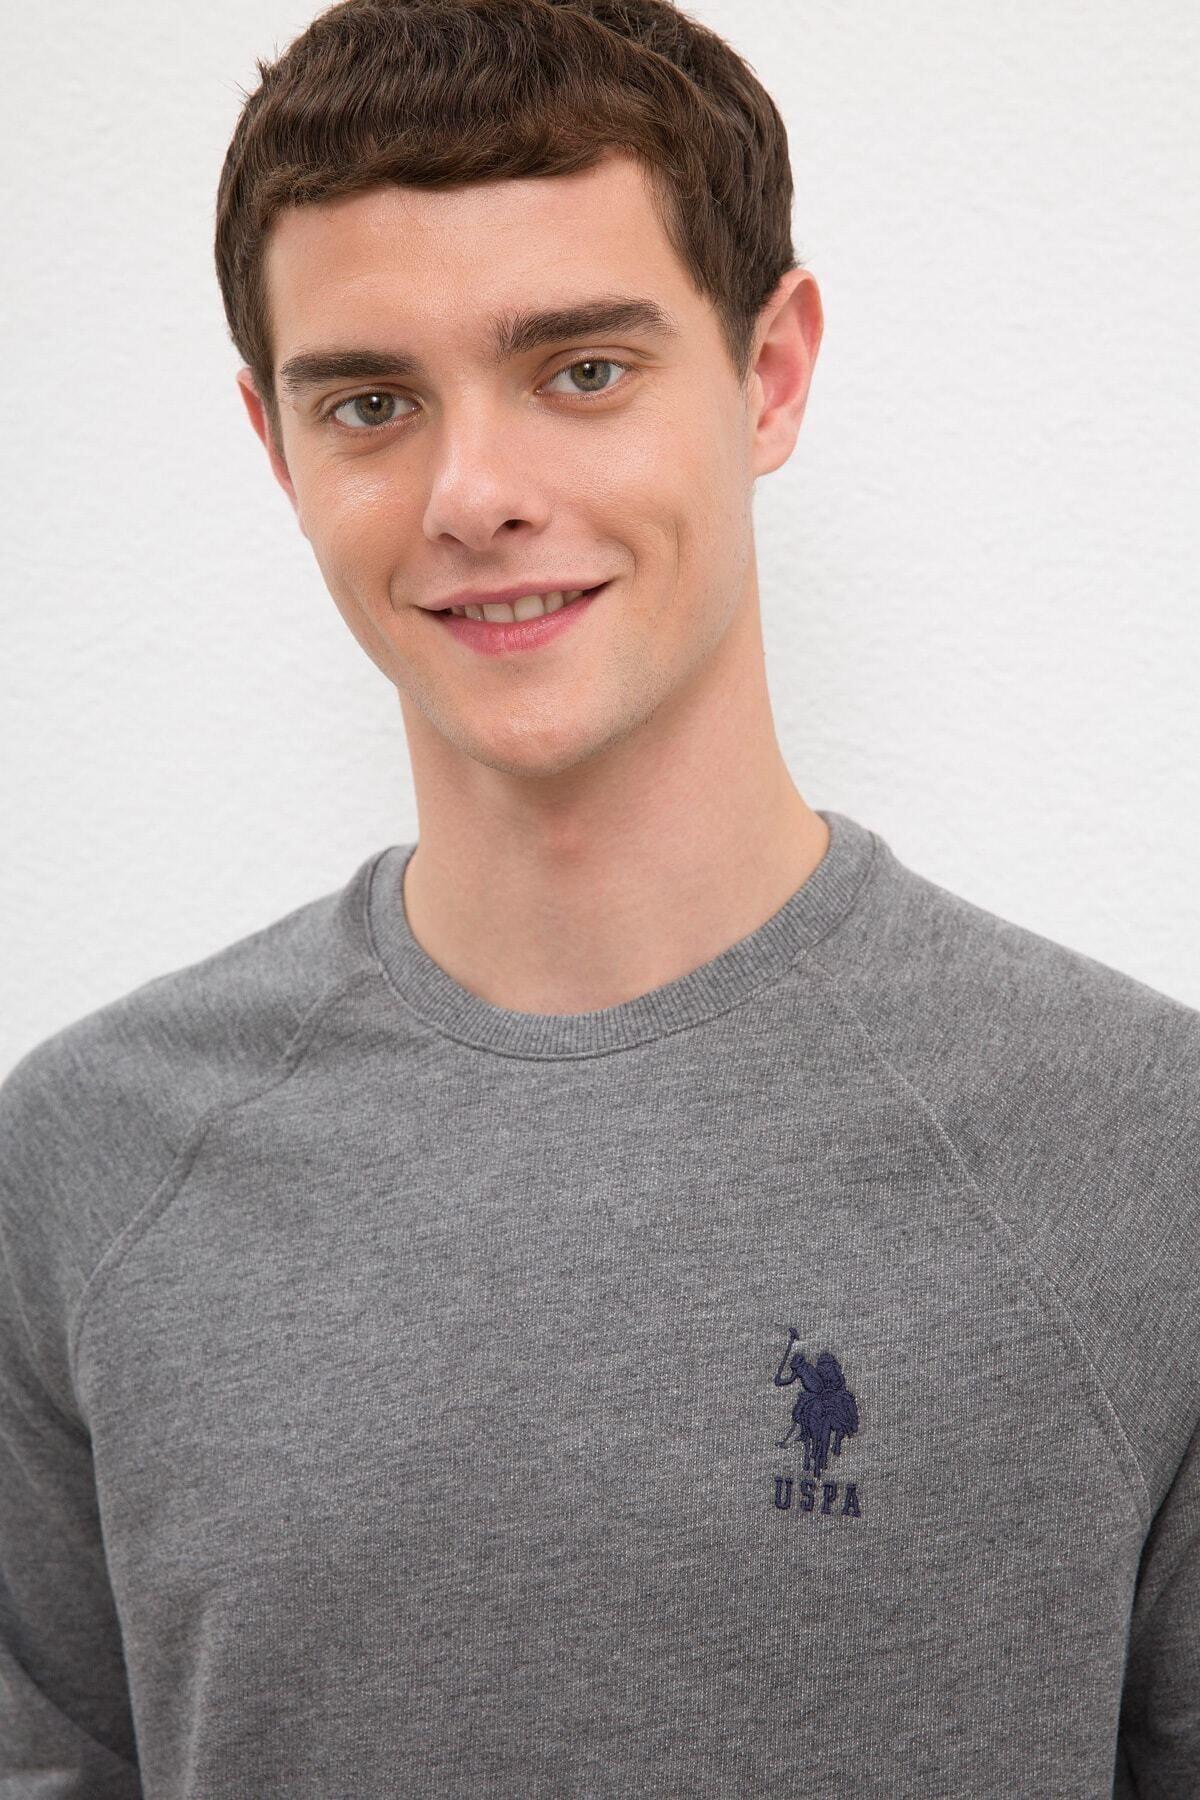 U.S. Polo Assn. Grı Erkek Sweatshirt 2